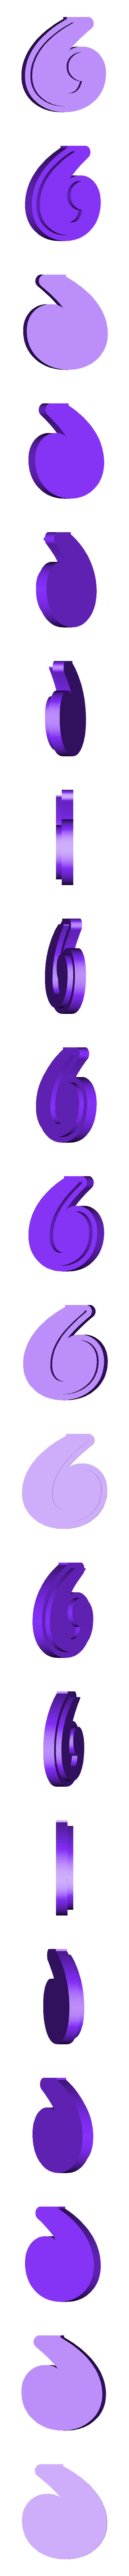 Wall Clock_6.stl Download free STL file Numbers for Bird wall clock • 3D printable design, MAyobe